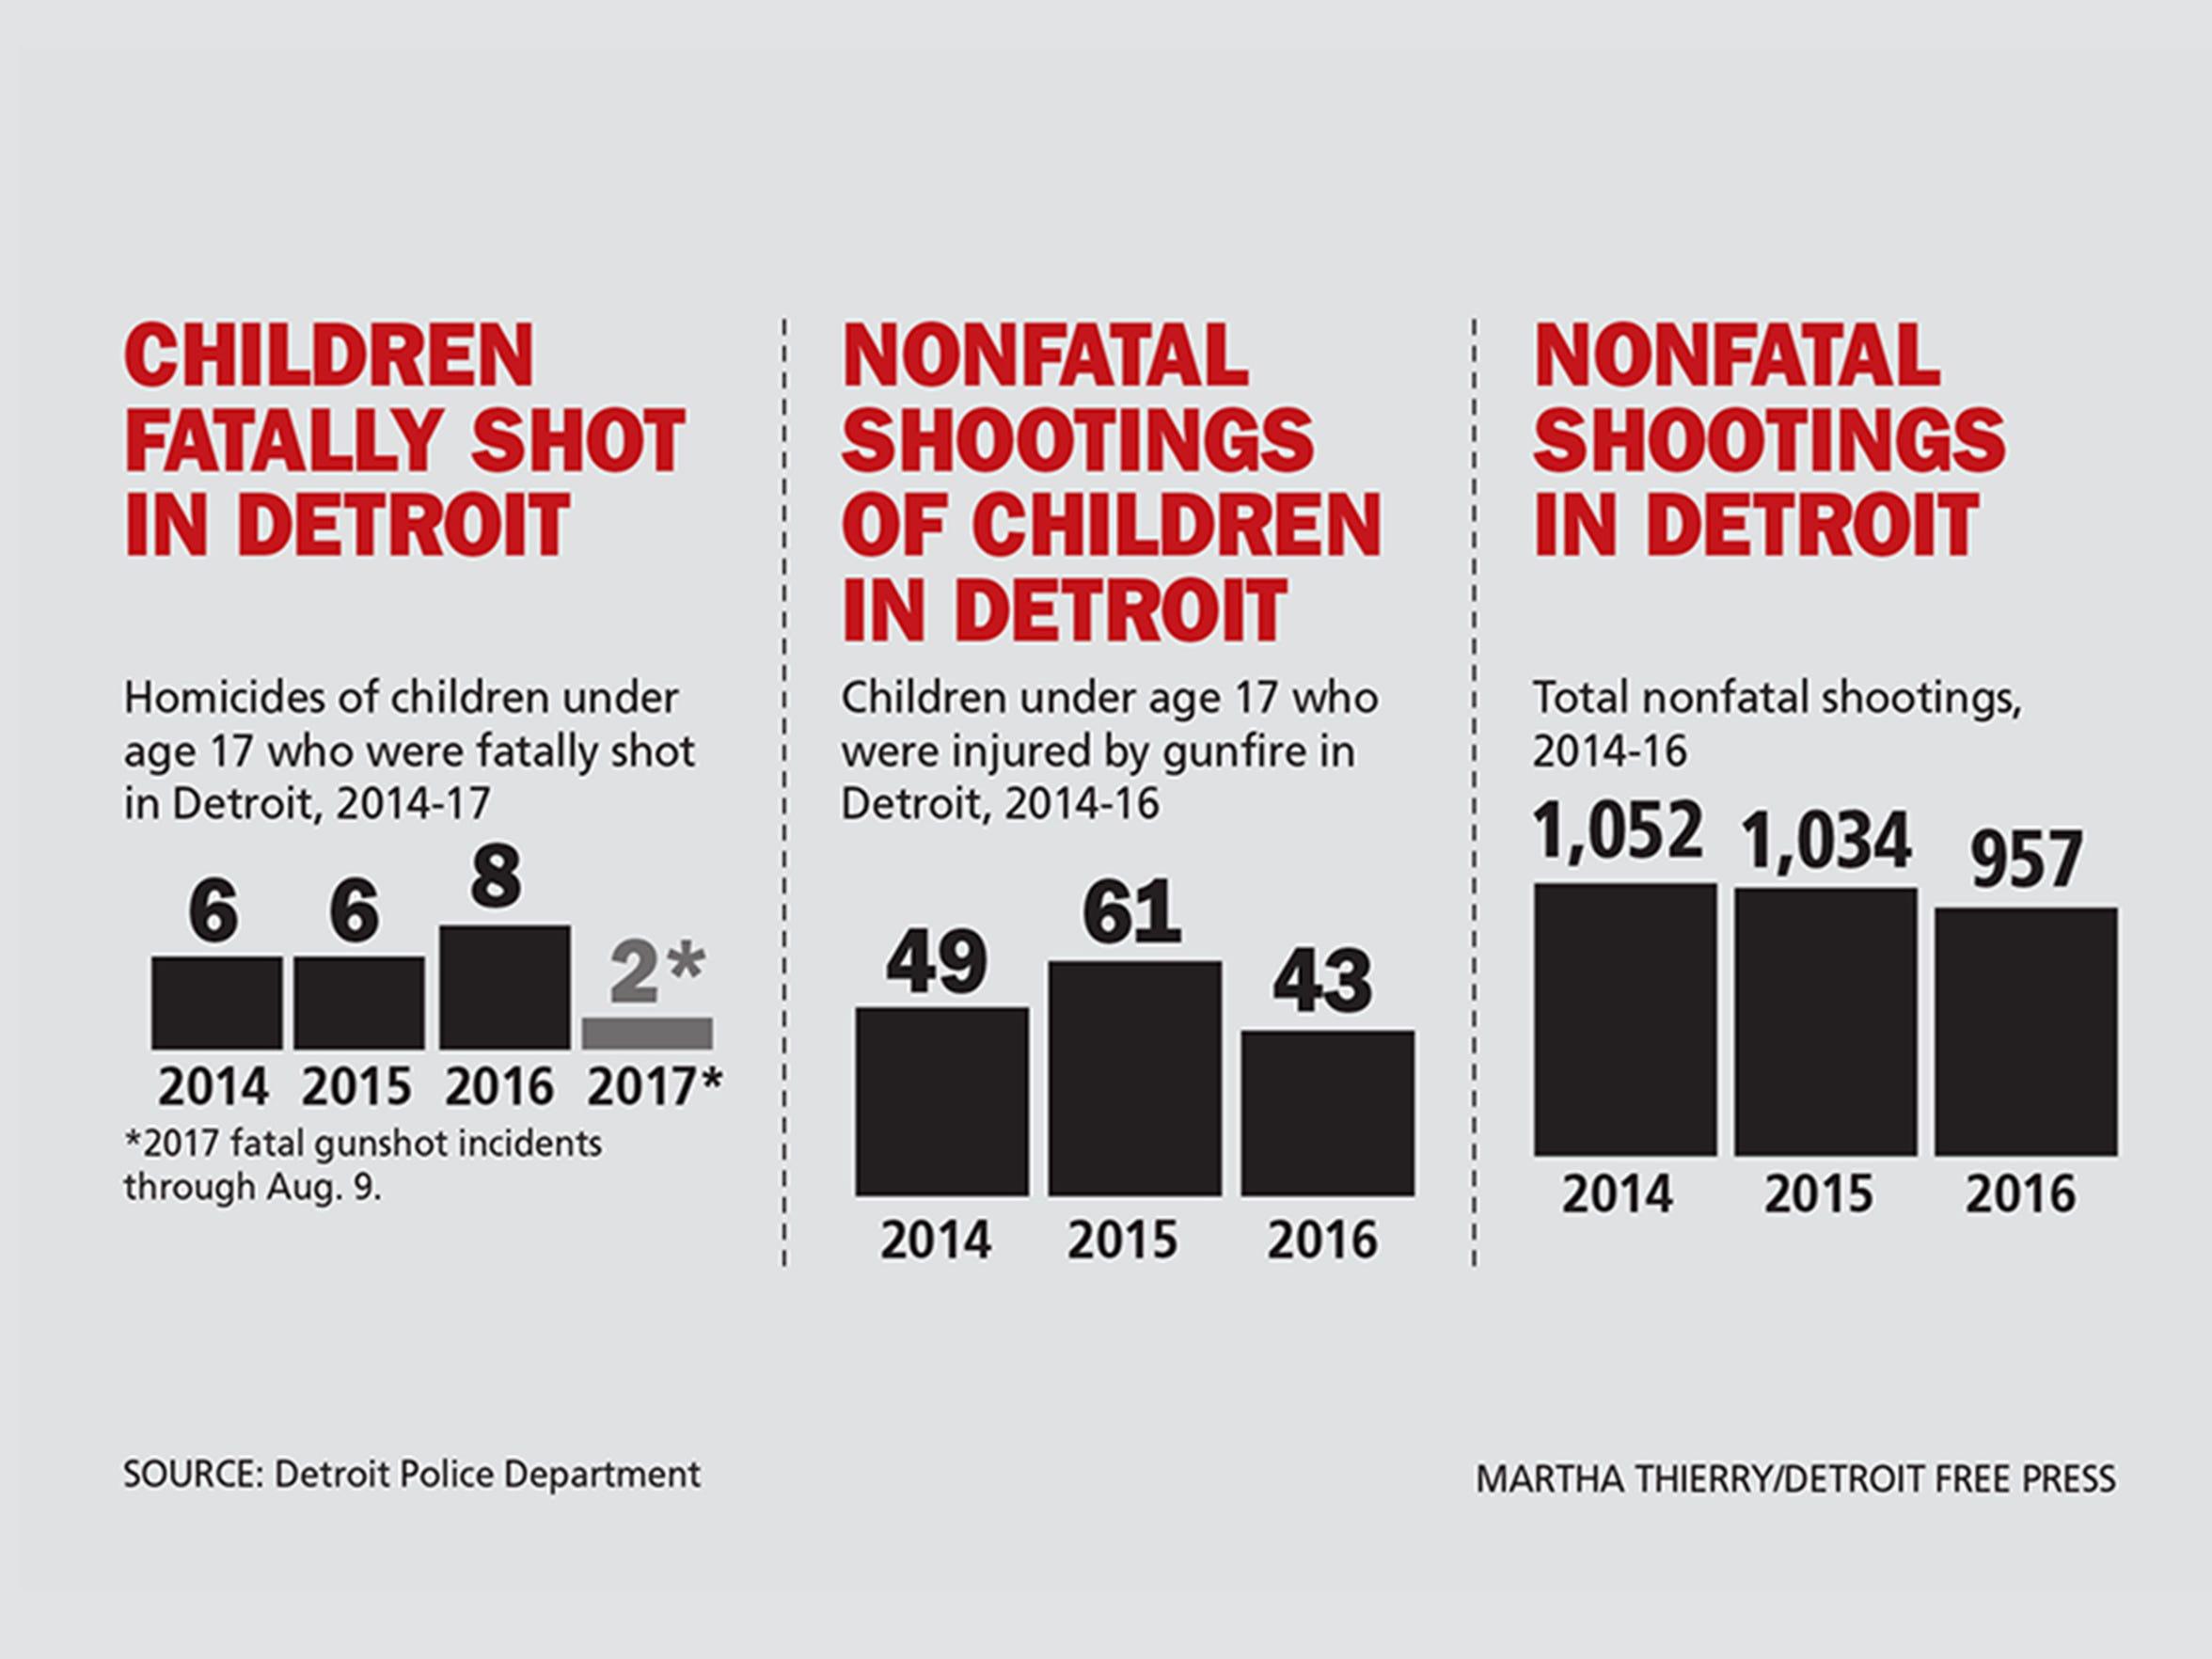 Shootings of children in Detroit.